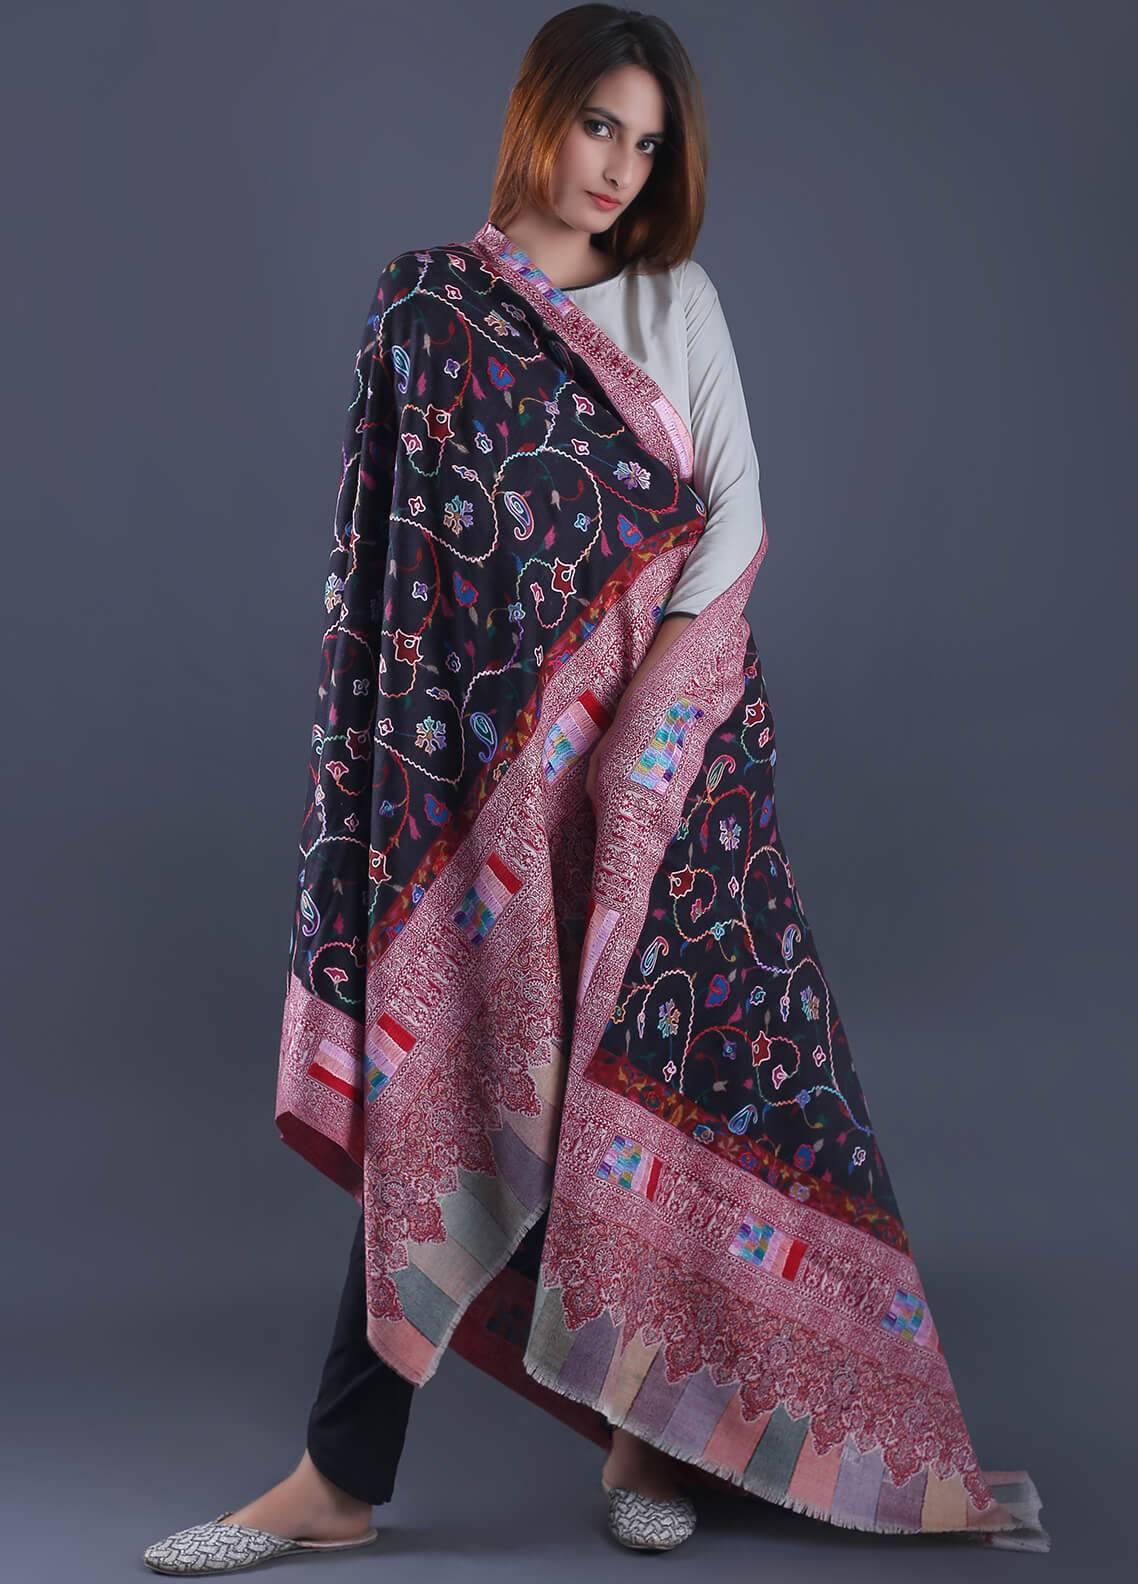 Sanaulla Exclusive Range Textured Pashmina  Shawl 30 - Formal Collection